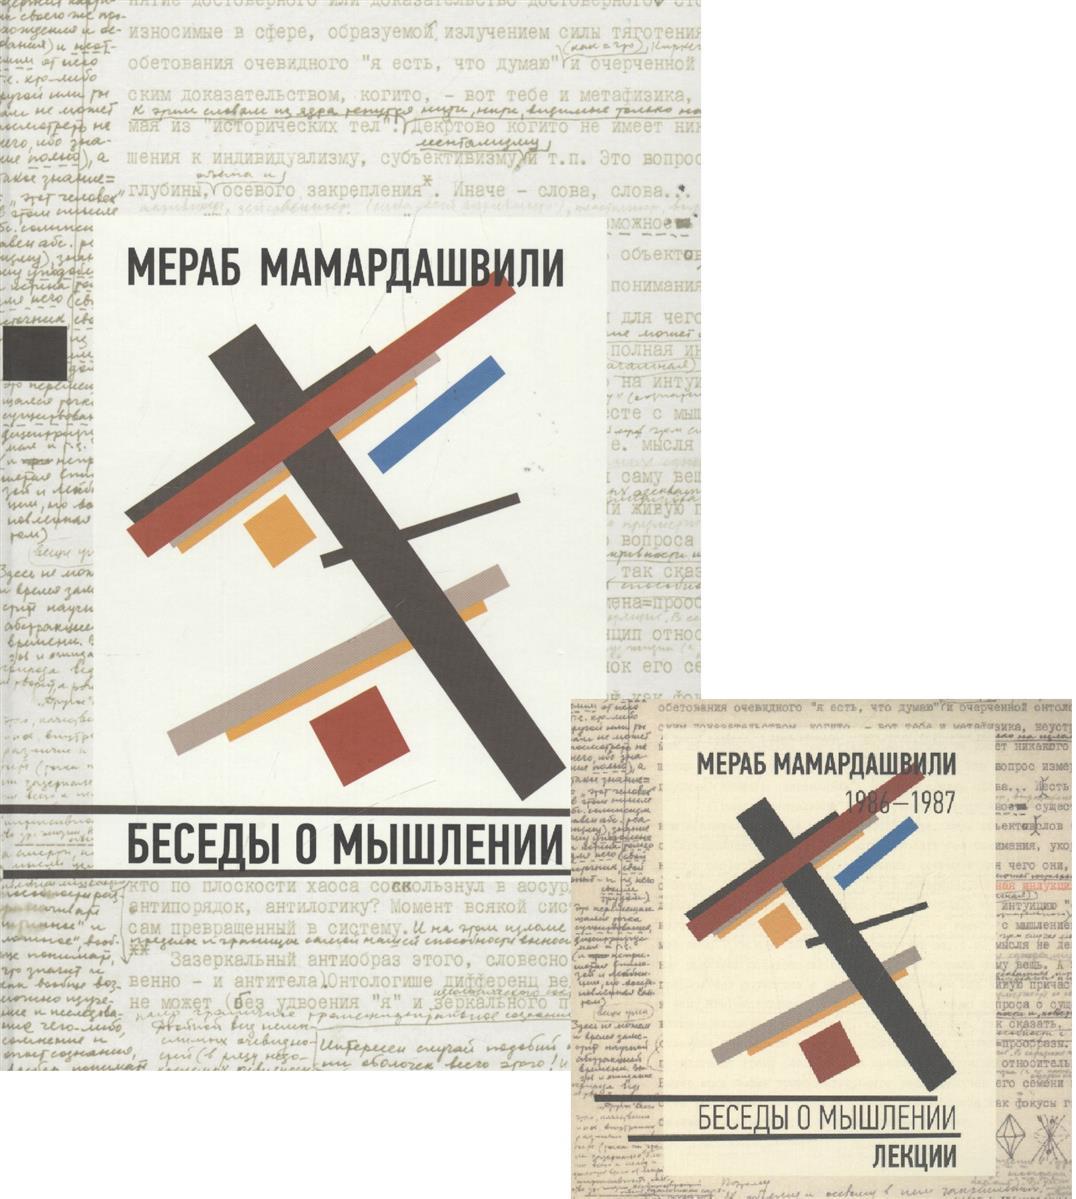 Мамардашвили М. Беседы о мышлении + CD мамардашвили м беседы о мышлении cd